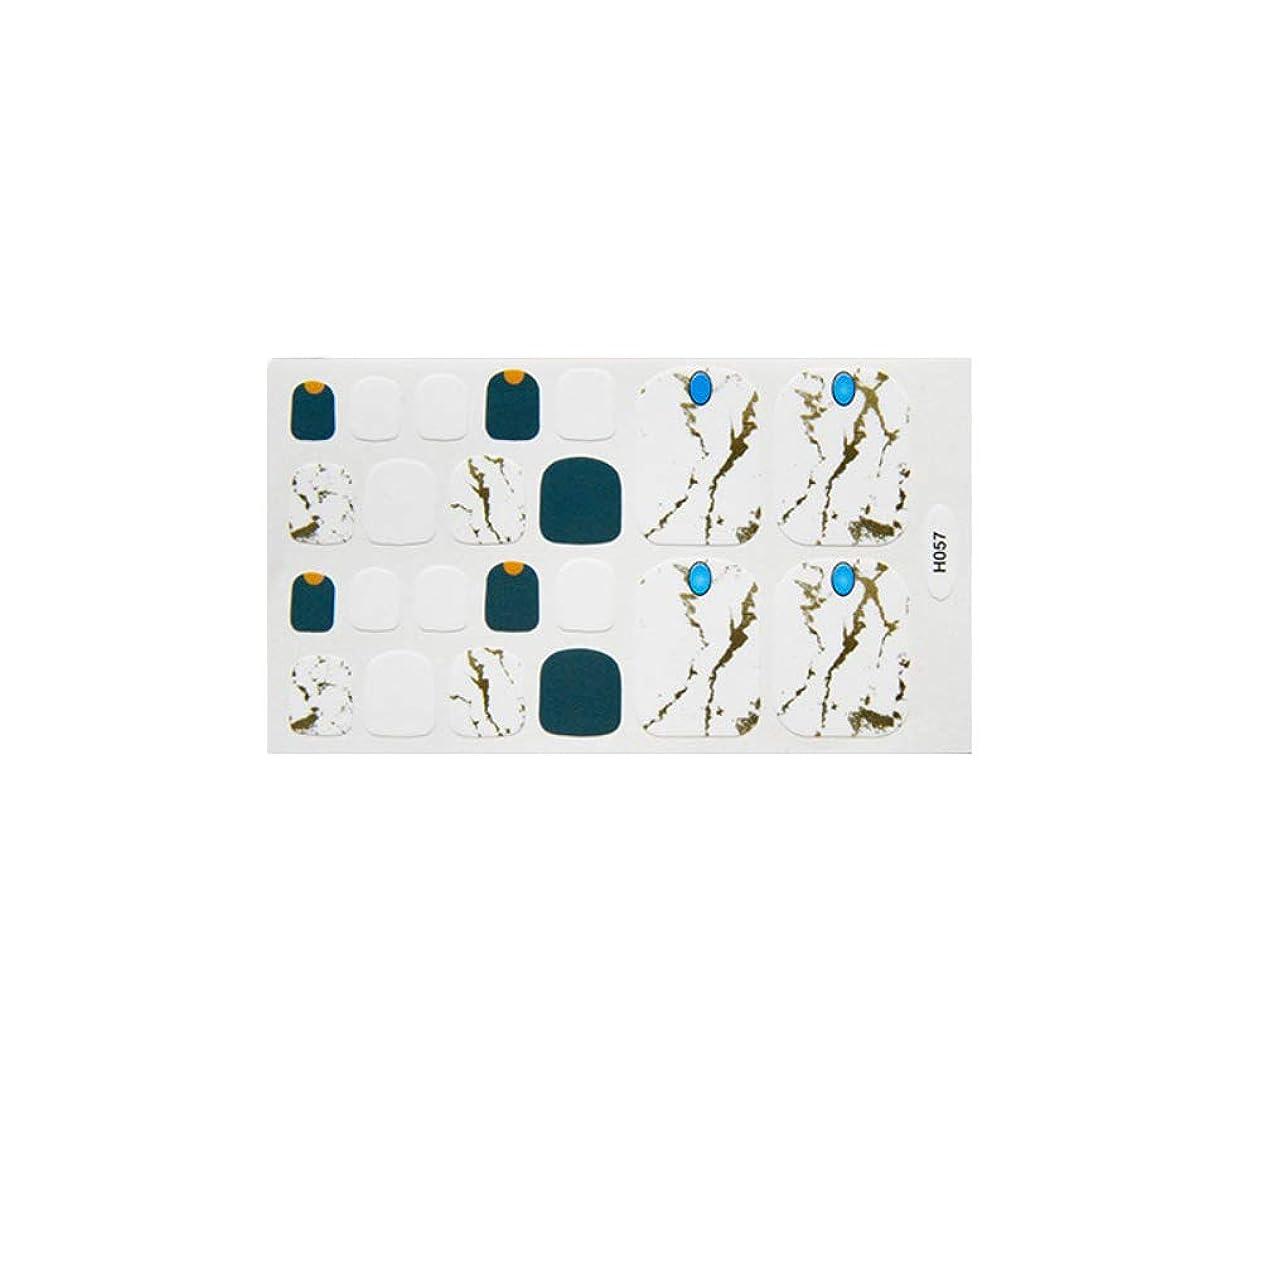 Poonikuuネイルステッカー ネイルアクセサリー 貼るだけシンプル 夏 足爪装飾 女性レディース ファション優雅 1セット 22枚 スタイル2